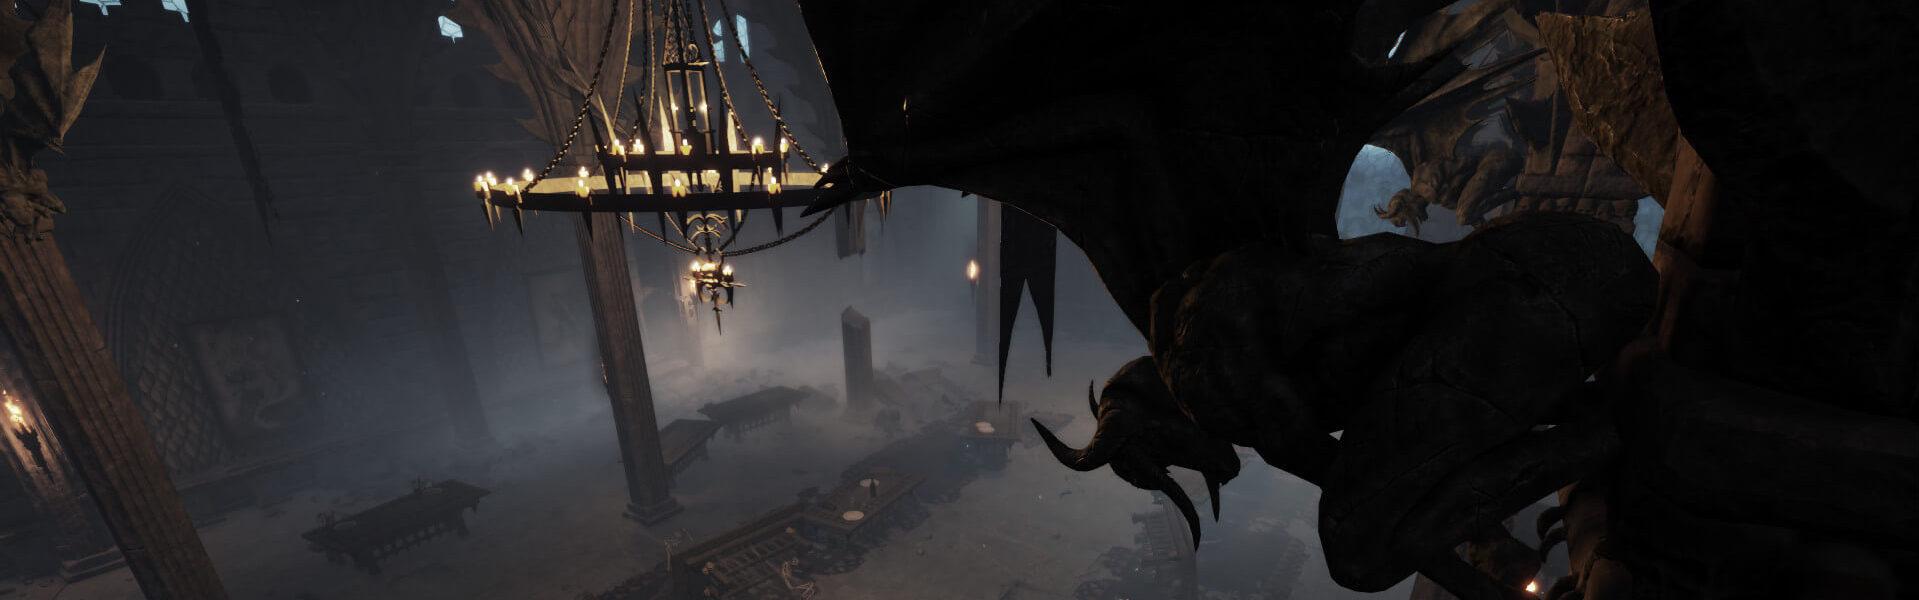 Warhammer The End Times - Vermintide Drachenfels (DLC) Steam Key GLOBAL